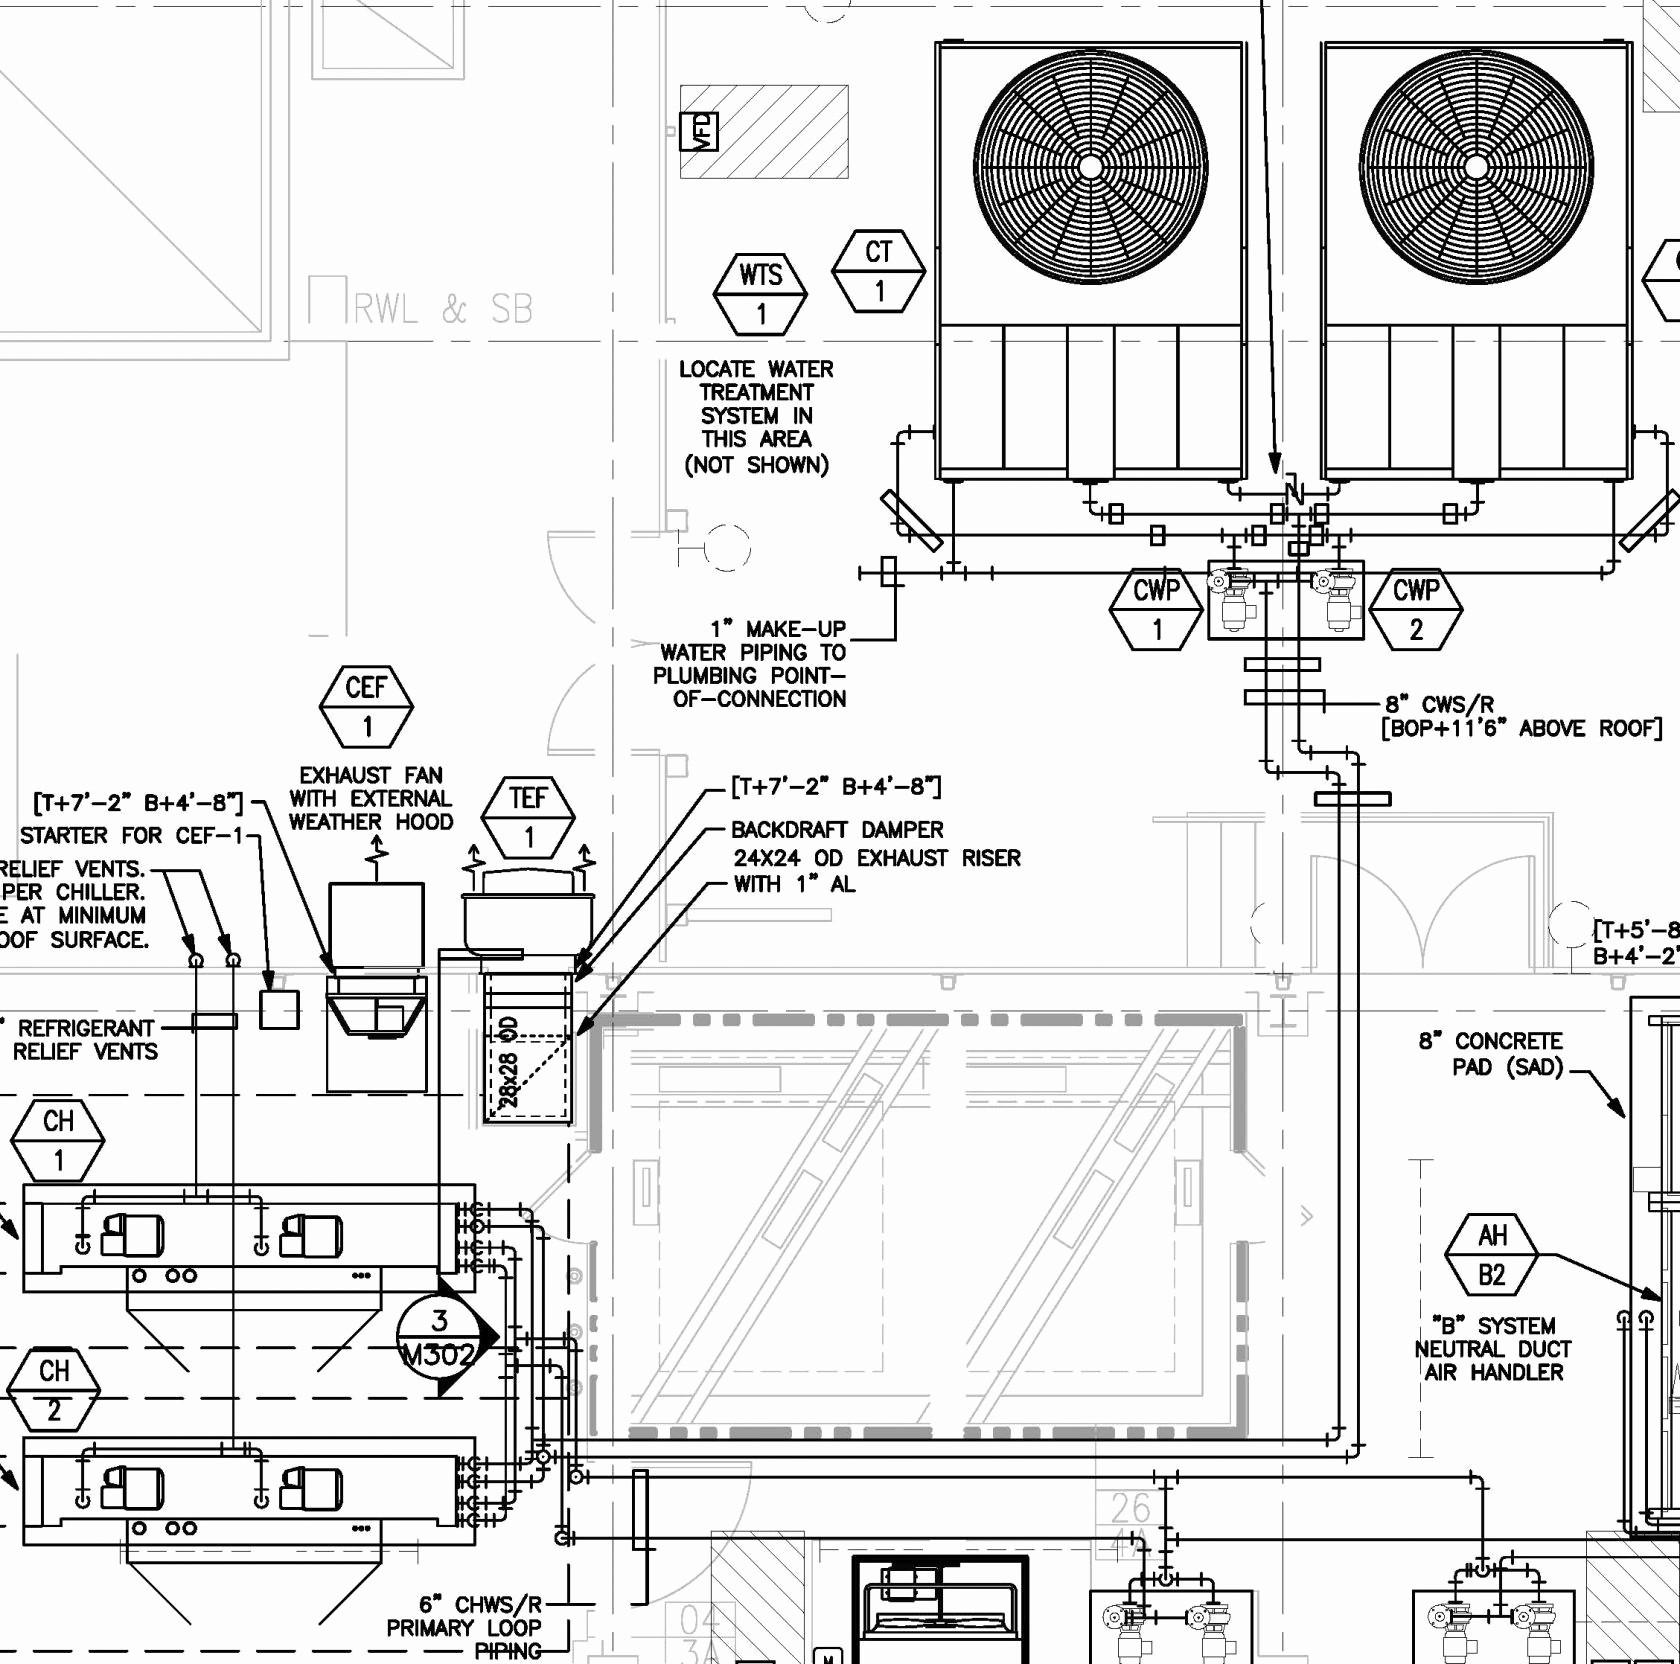 Book Wiring Design - Great Installation Of Wiring Diagram • - Swimming Pool Electrical Wiring Diagram